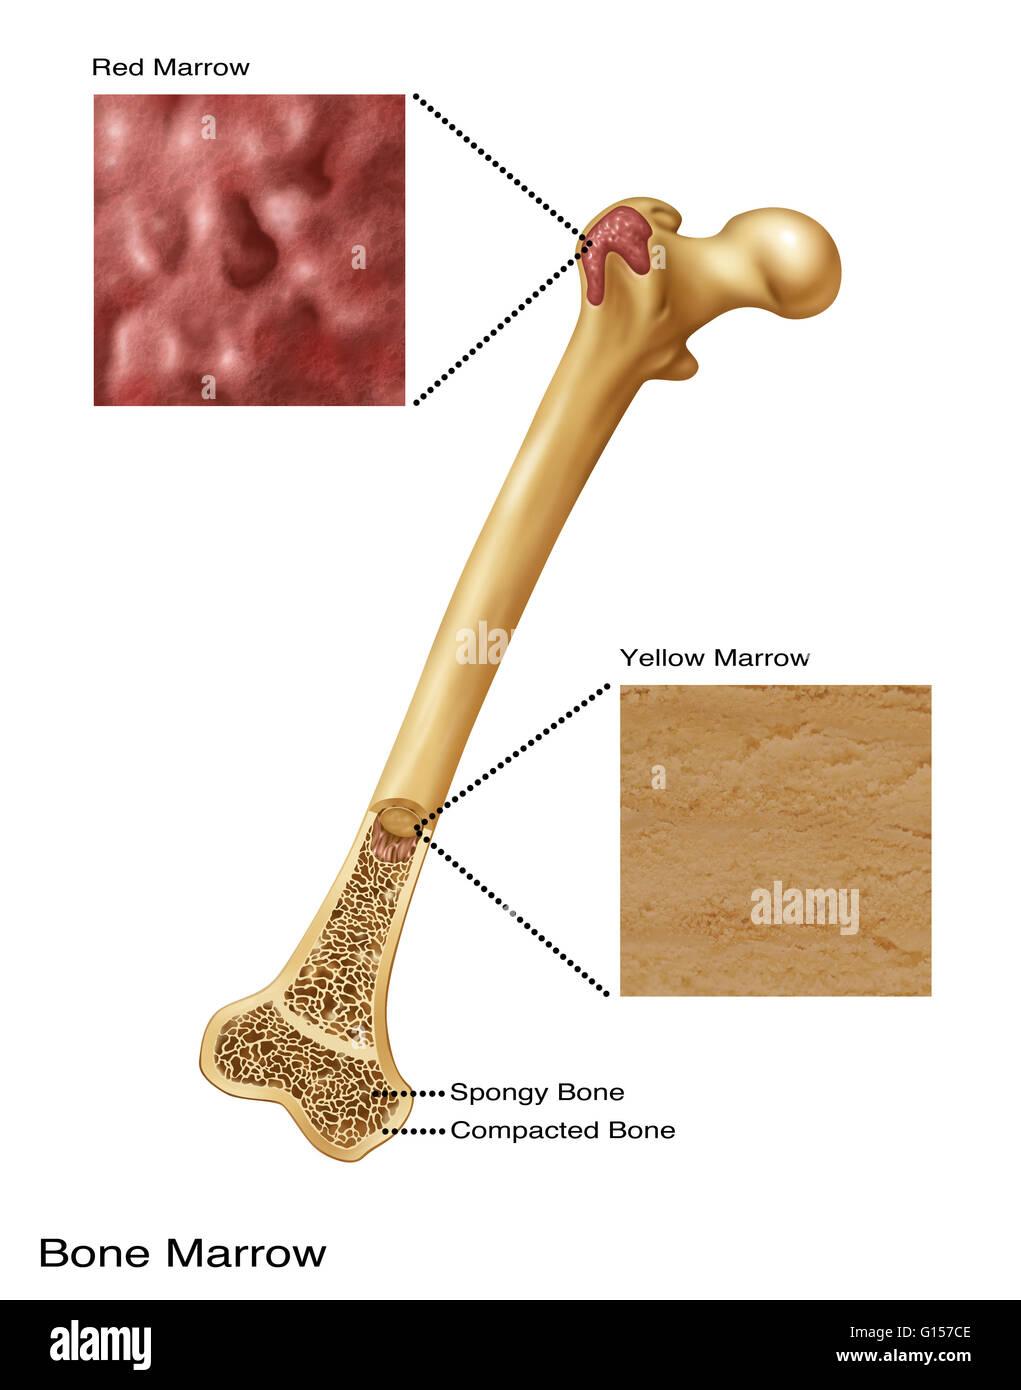 hight resolution of illustration of bone marrow top diagram shows red bone marrow bottom diagram shows yellow